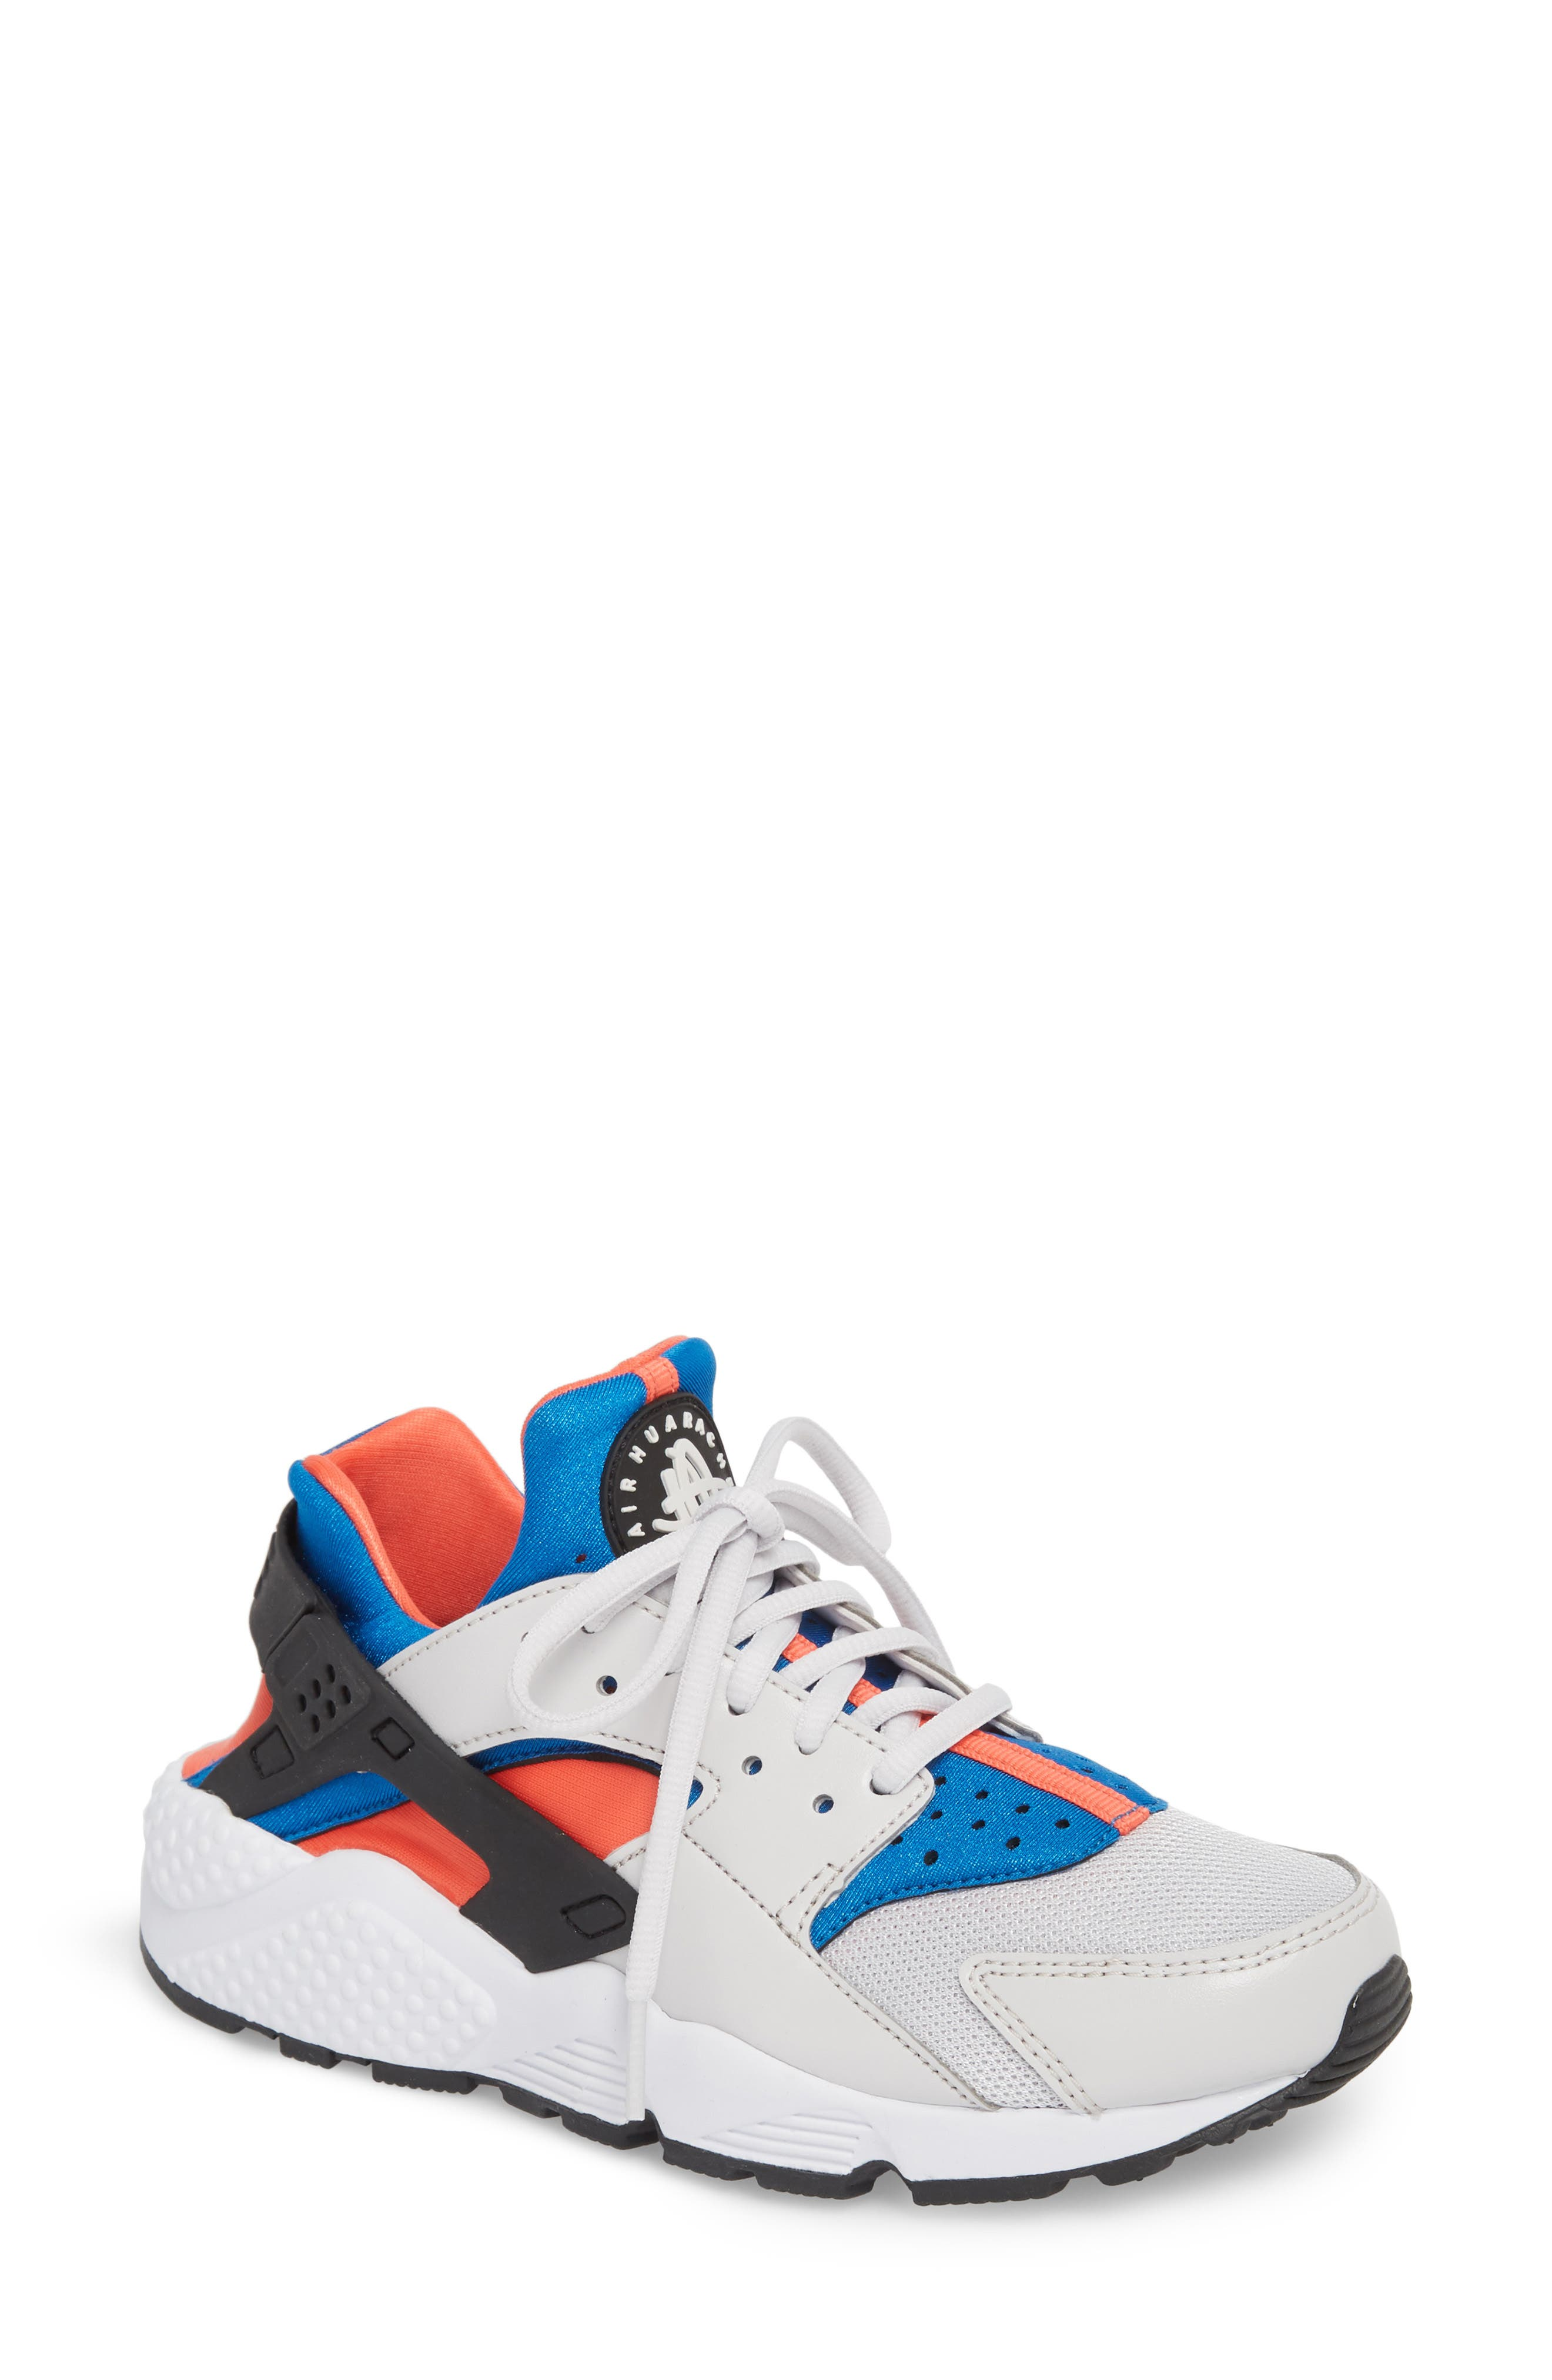 Air Huarache Run Sneaker,                             Main thumbnail 1, color,                             Grey/ Black/ Coral/ Nebula